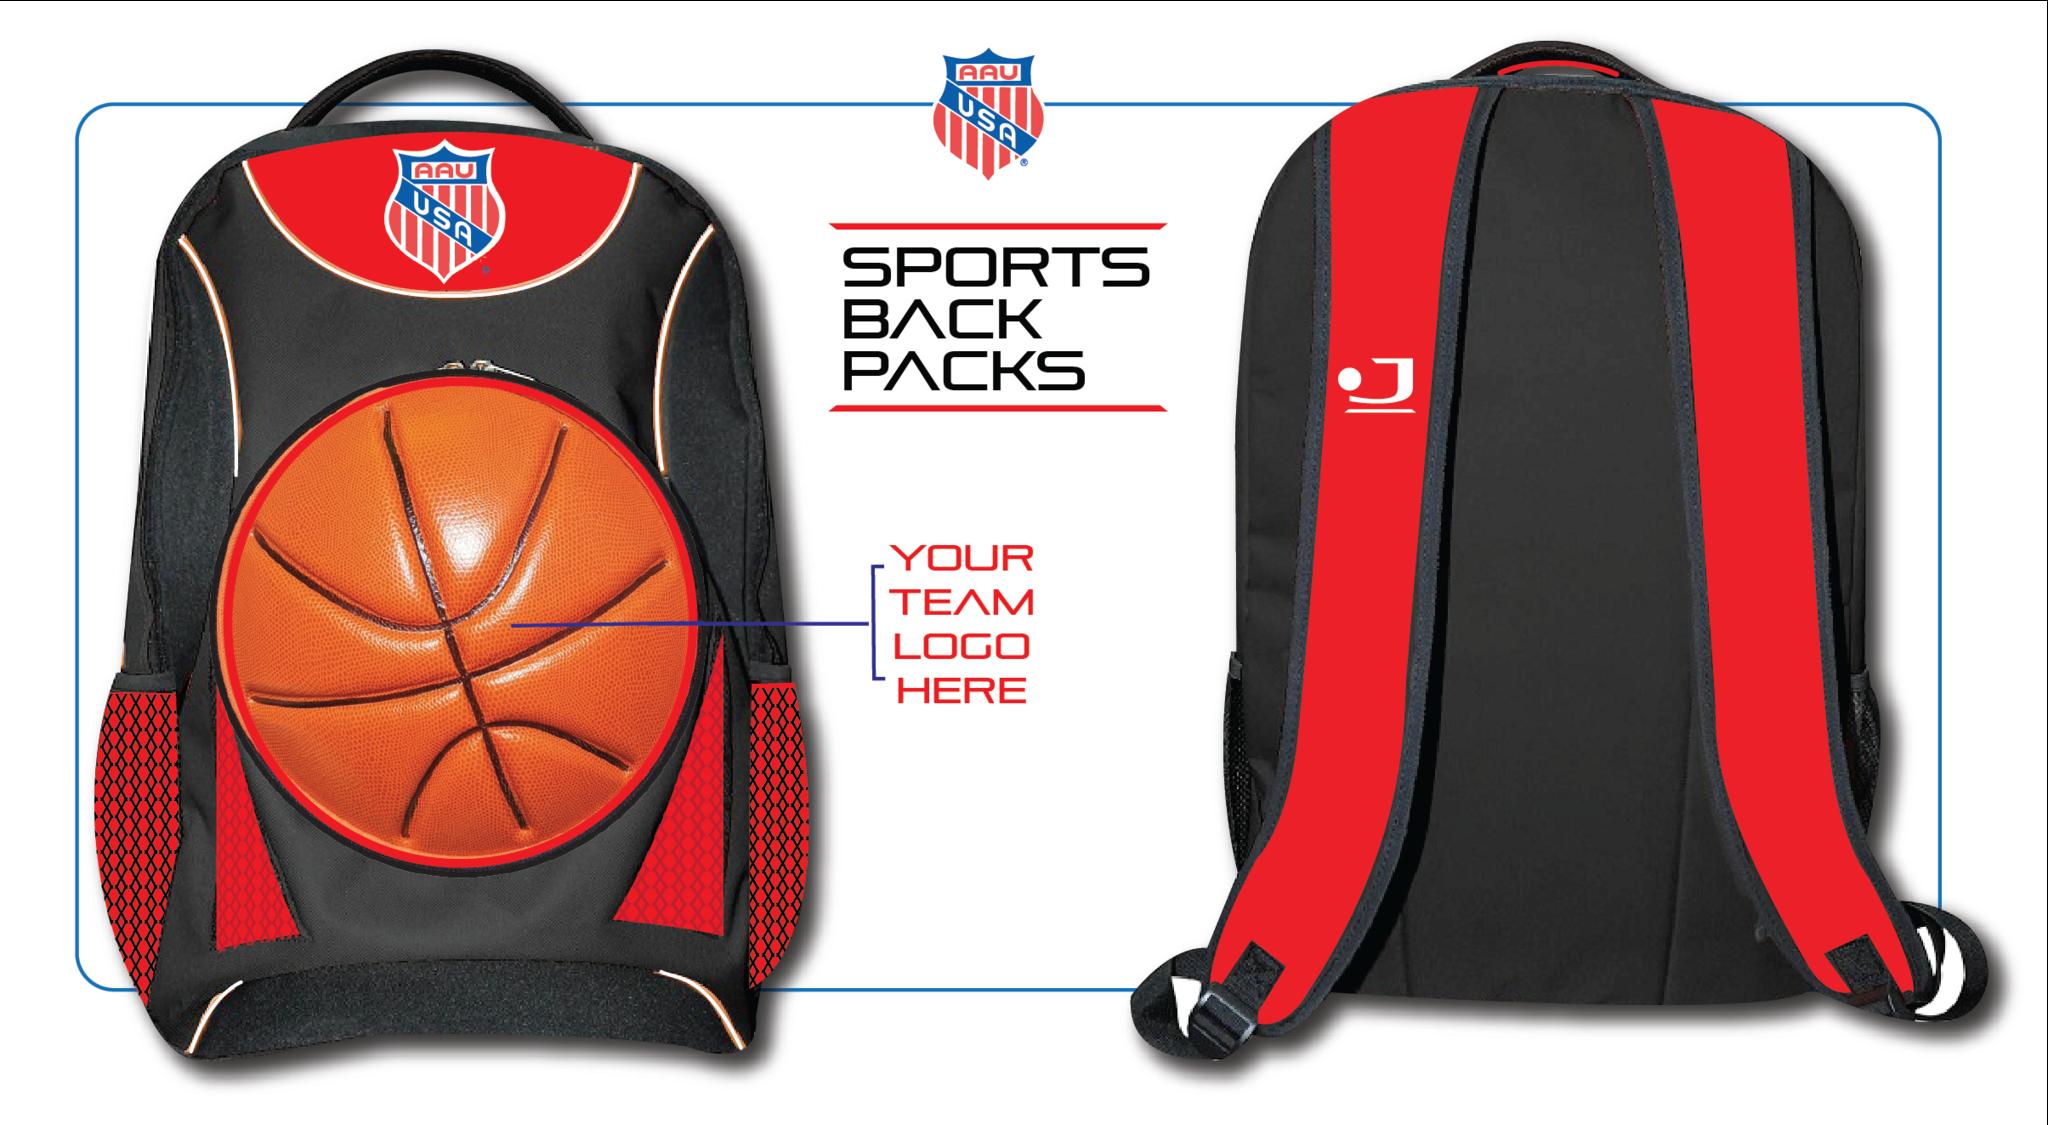 best selection of drop shipping terrific value AAU Backpack Interchangeable Basketball | BKBaller ...